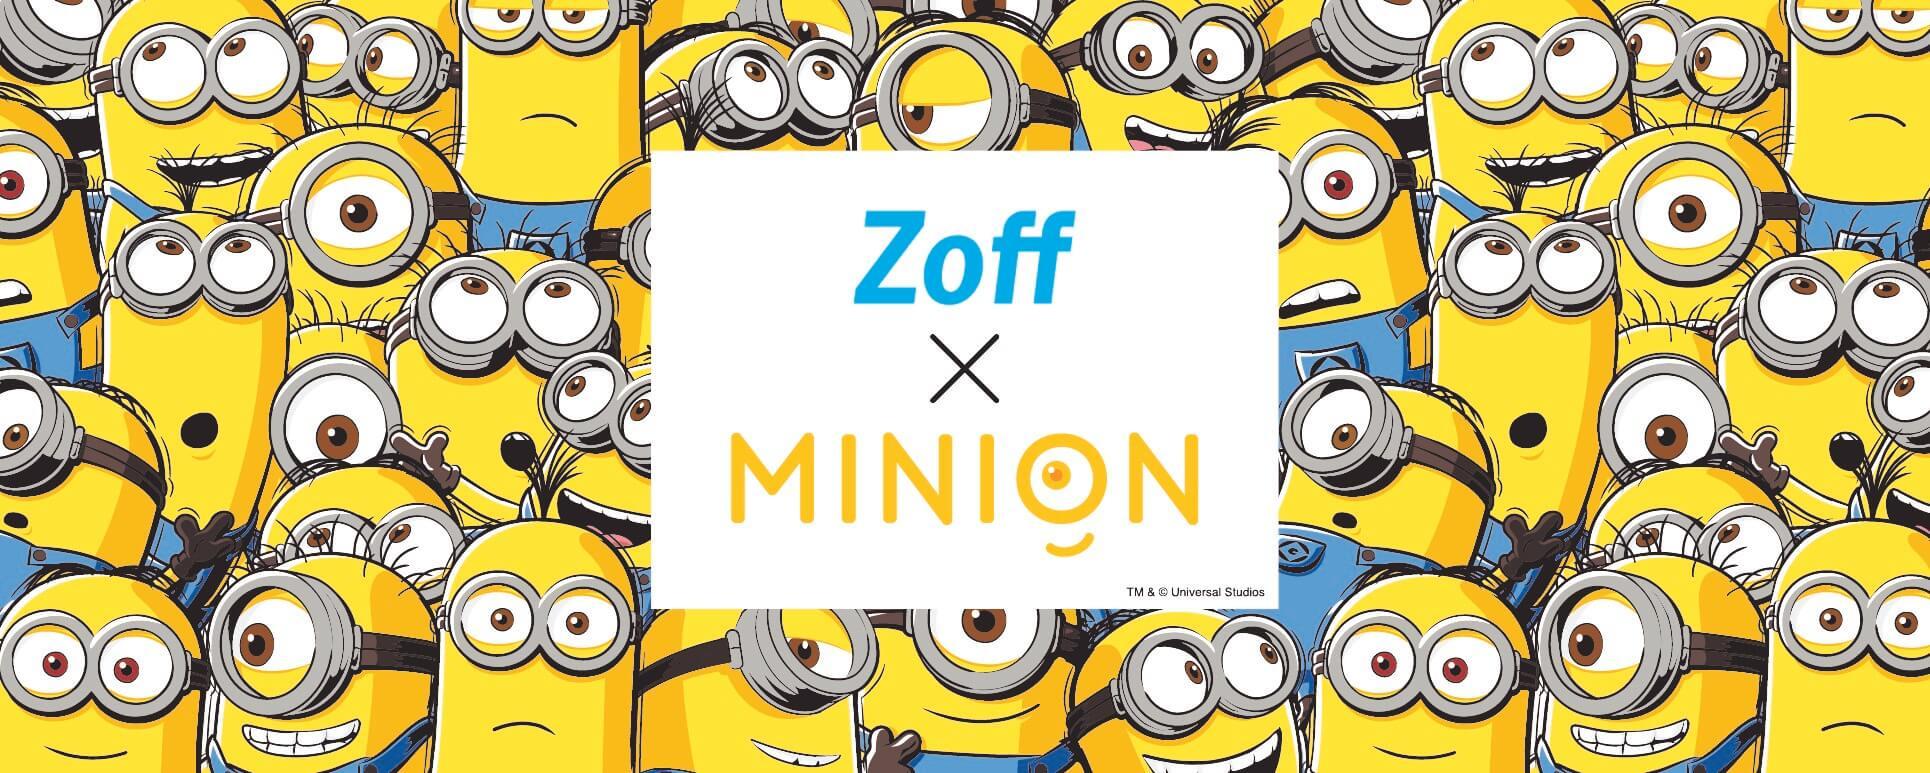 zoff MINION コラボメガネ collaboration eyeglass _KV